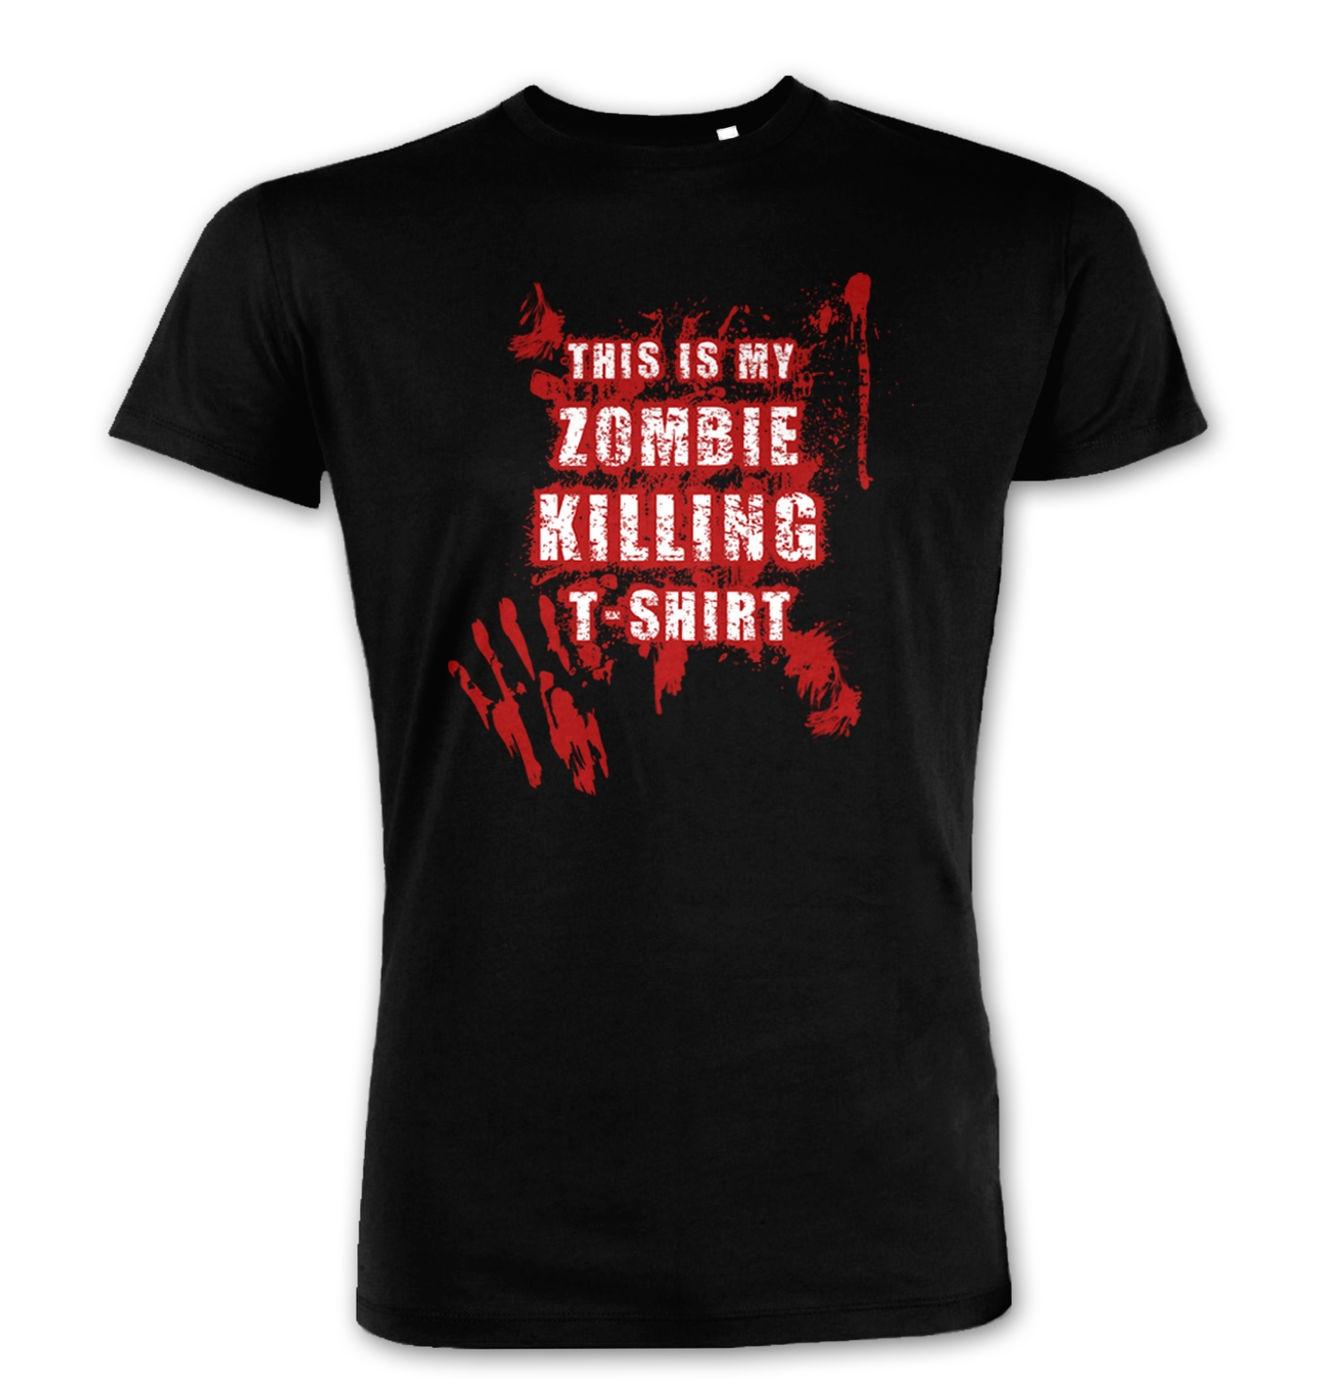 This Is My Zombie Killing Premium t-shirt men's Premium t-shirt